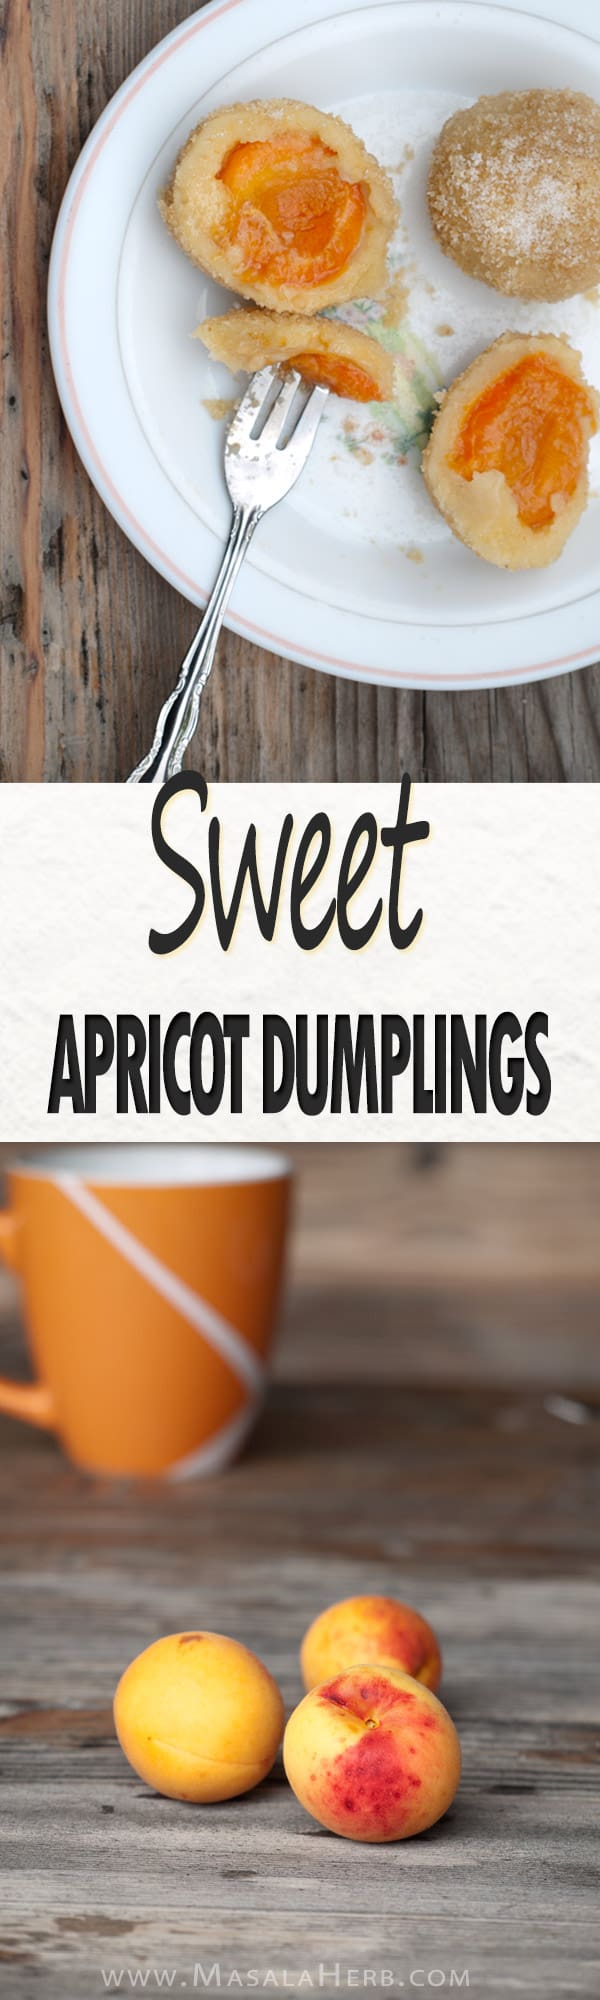 Sweet apricot dumplings aka Austrian Marillenknodel special dessert www.MasalaHerb.com #dessert #dumpling #apricot